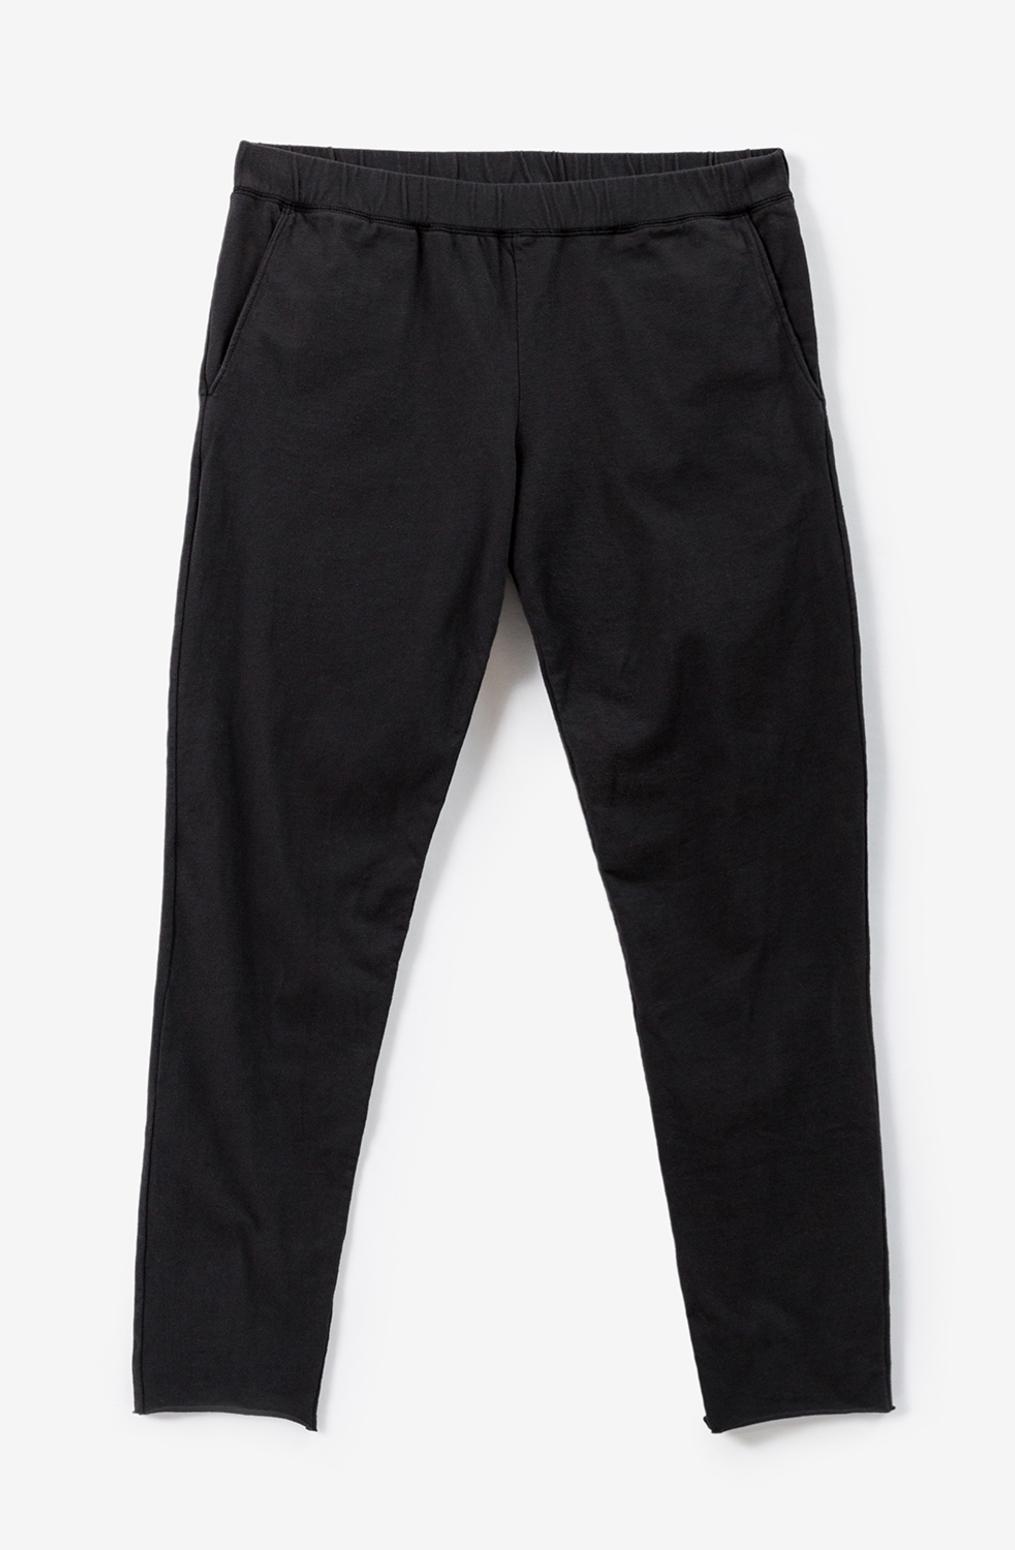 Alabama chanin organic cotton pullon jogger pants 2